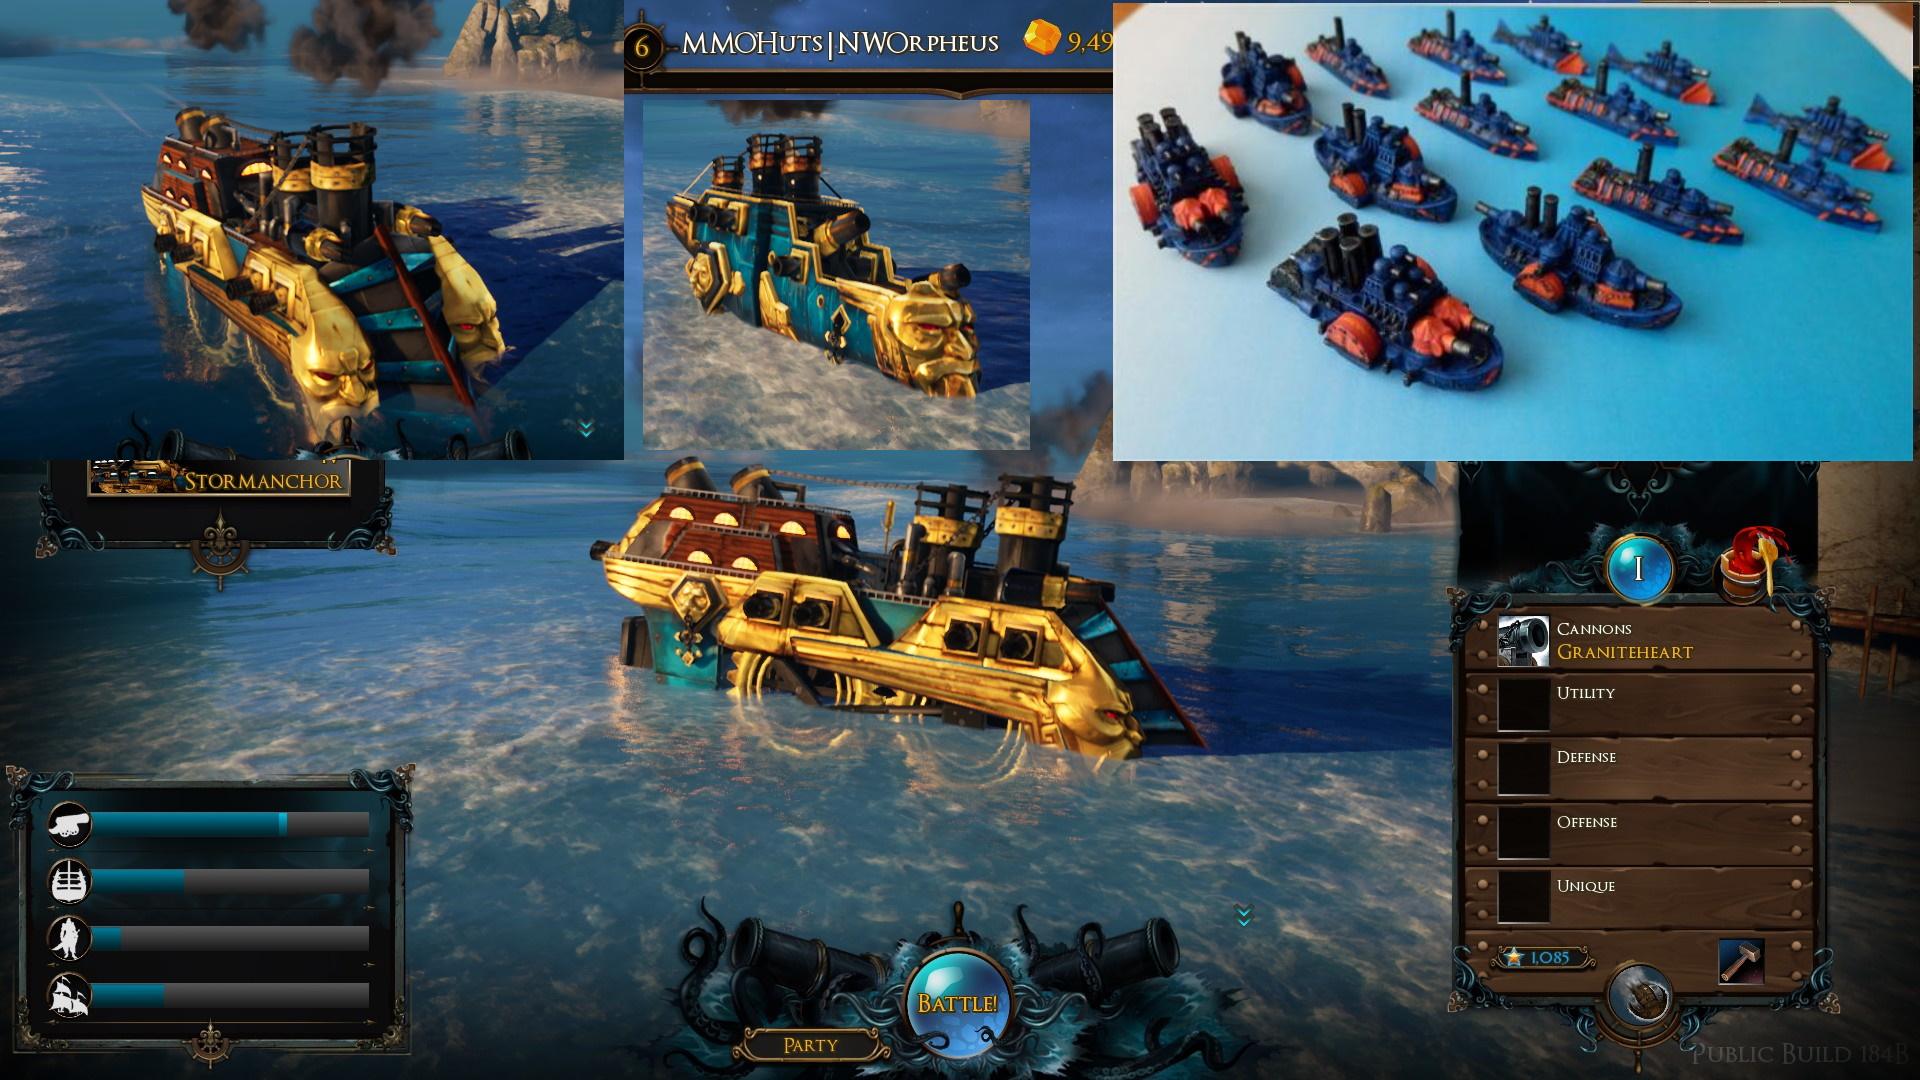 Maelstrom Dwarf Ships